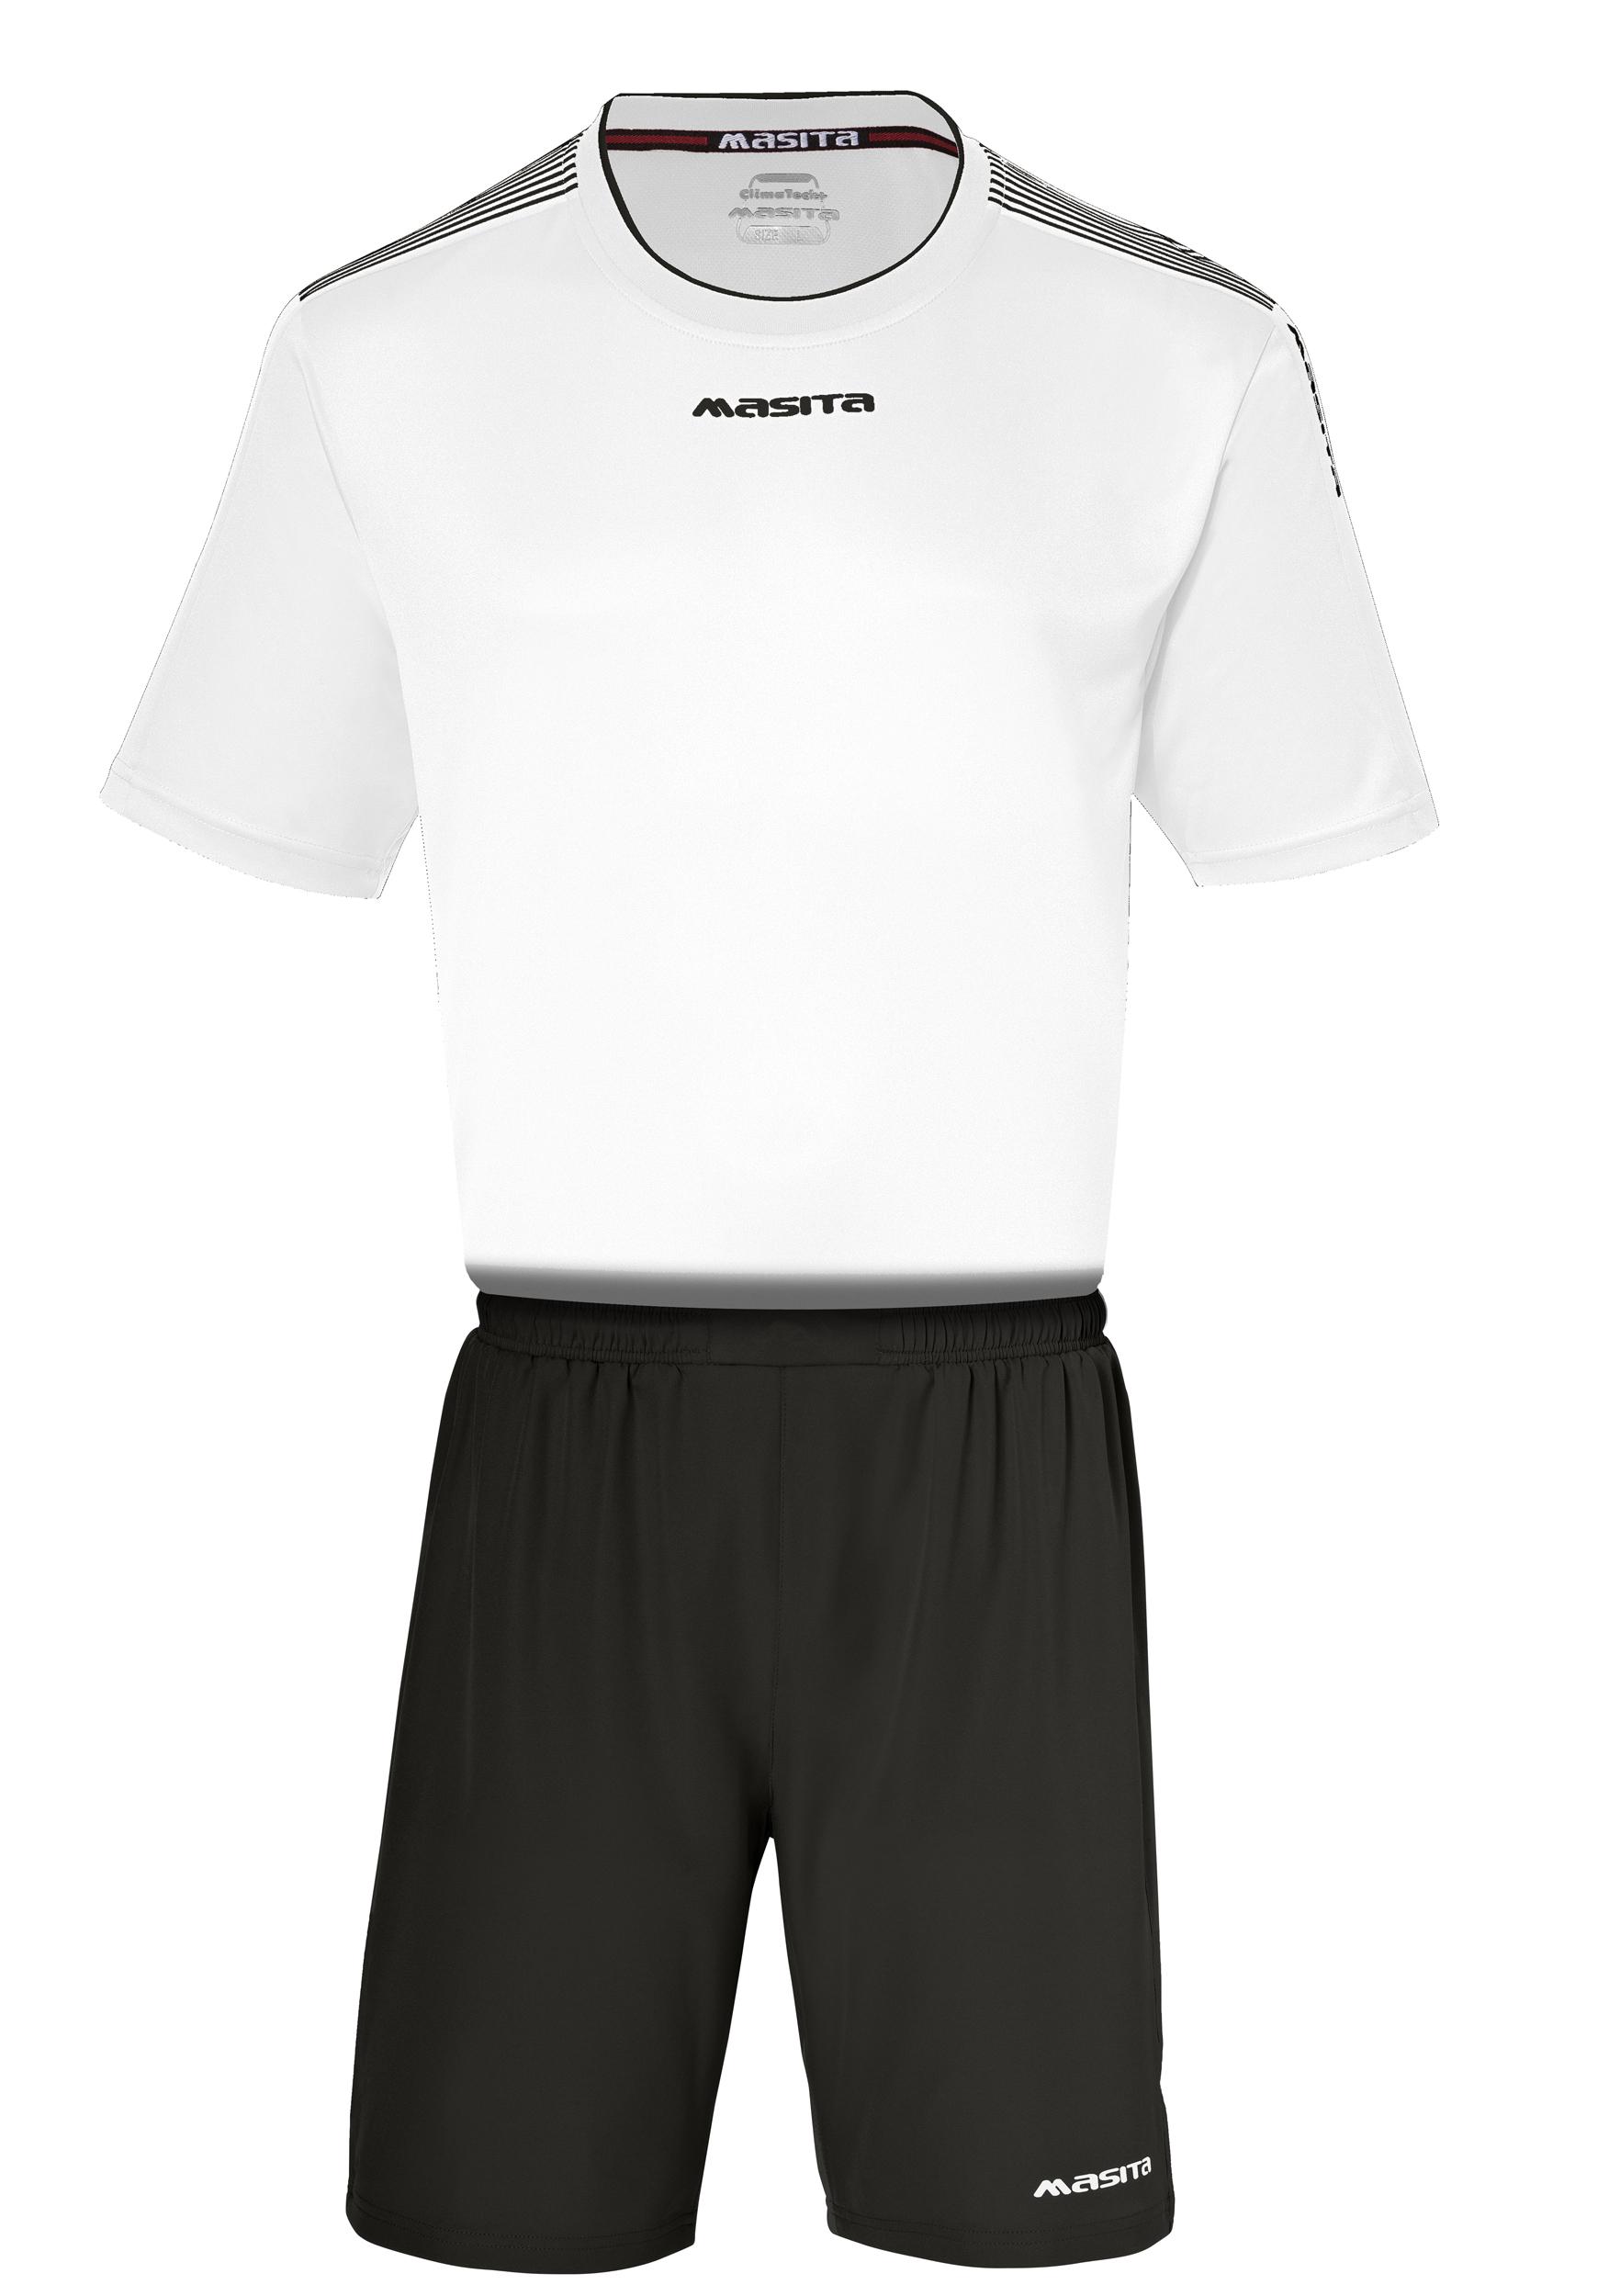 SportShirt Sevilla  White / Black